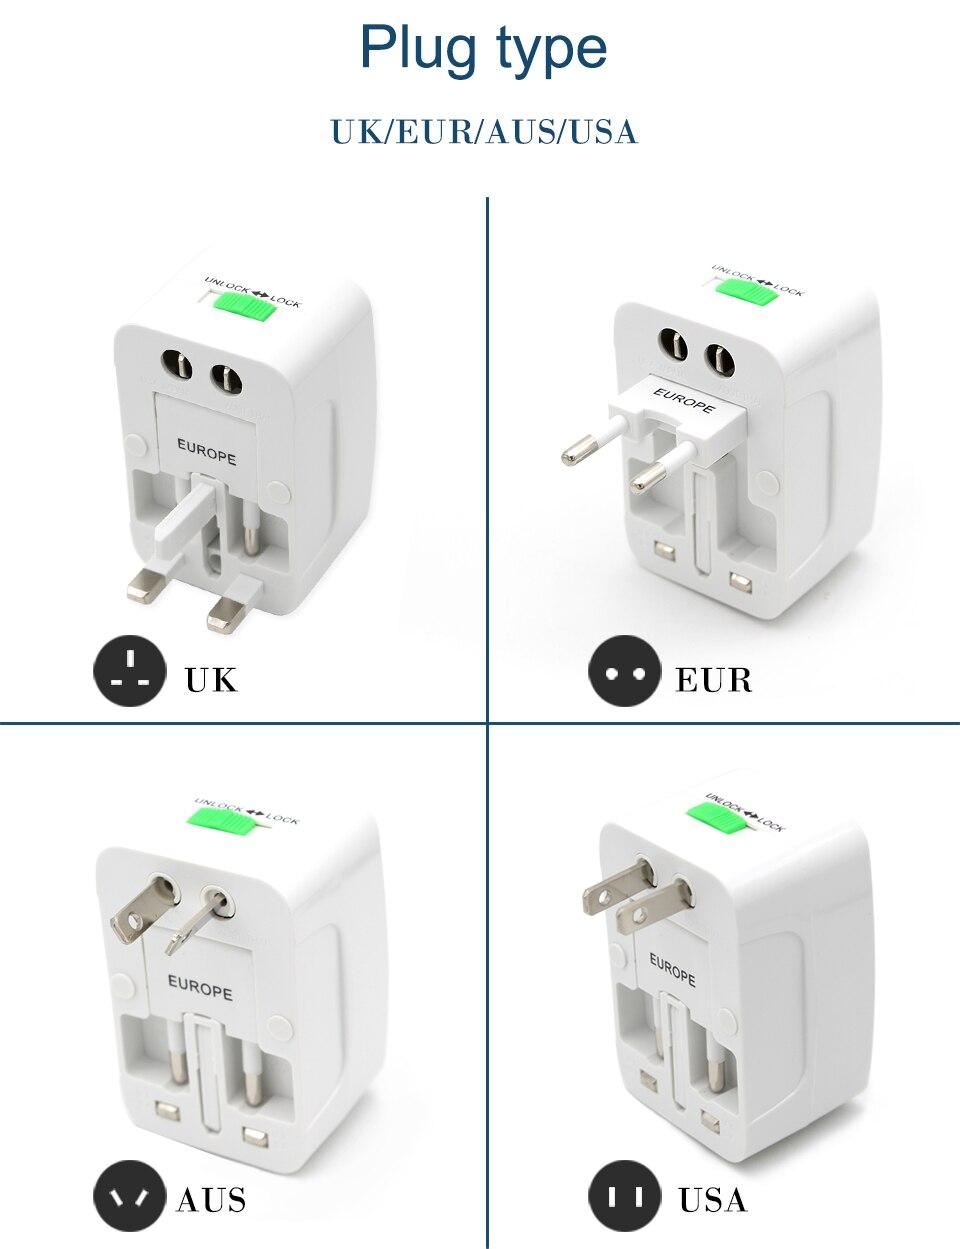 Universal Worldwide Adapter Electric Socket AU UK US EU Plug Adaptor Travel Wall Charger AC Power Option 2 USB Charging Port (3)